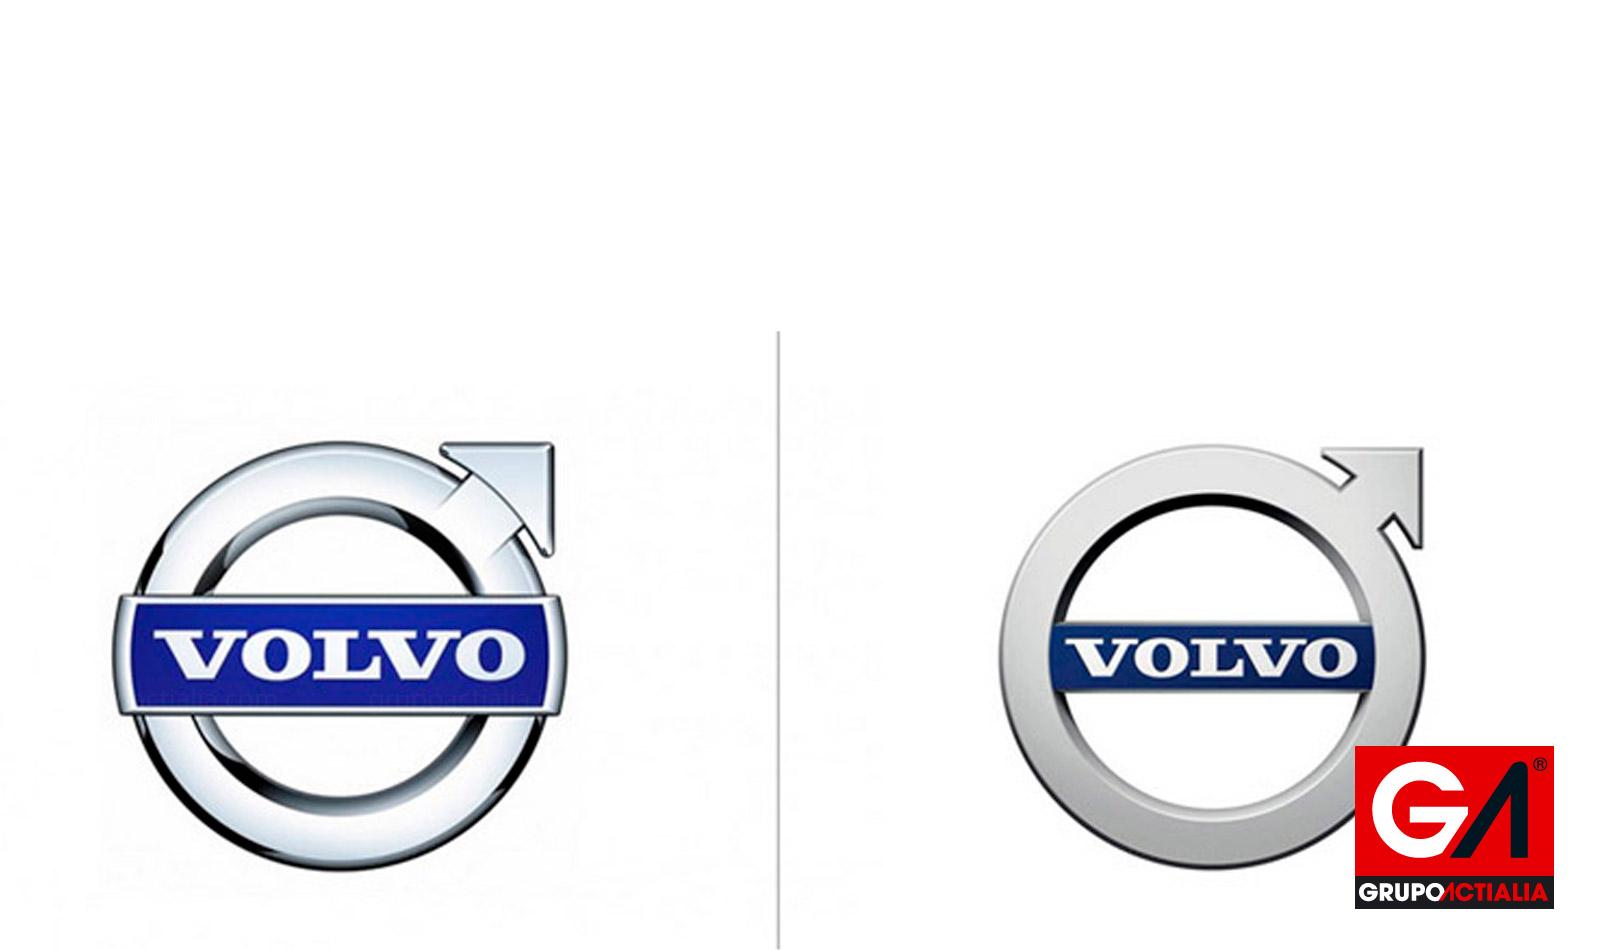 Volvo presenta nuevo logotipo